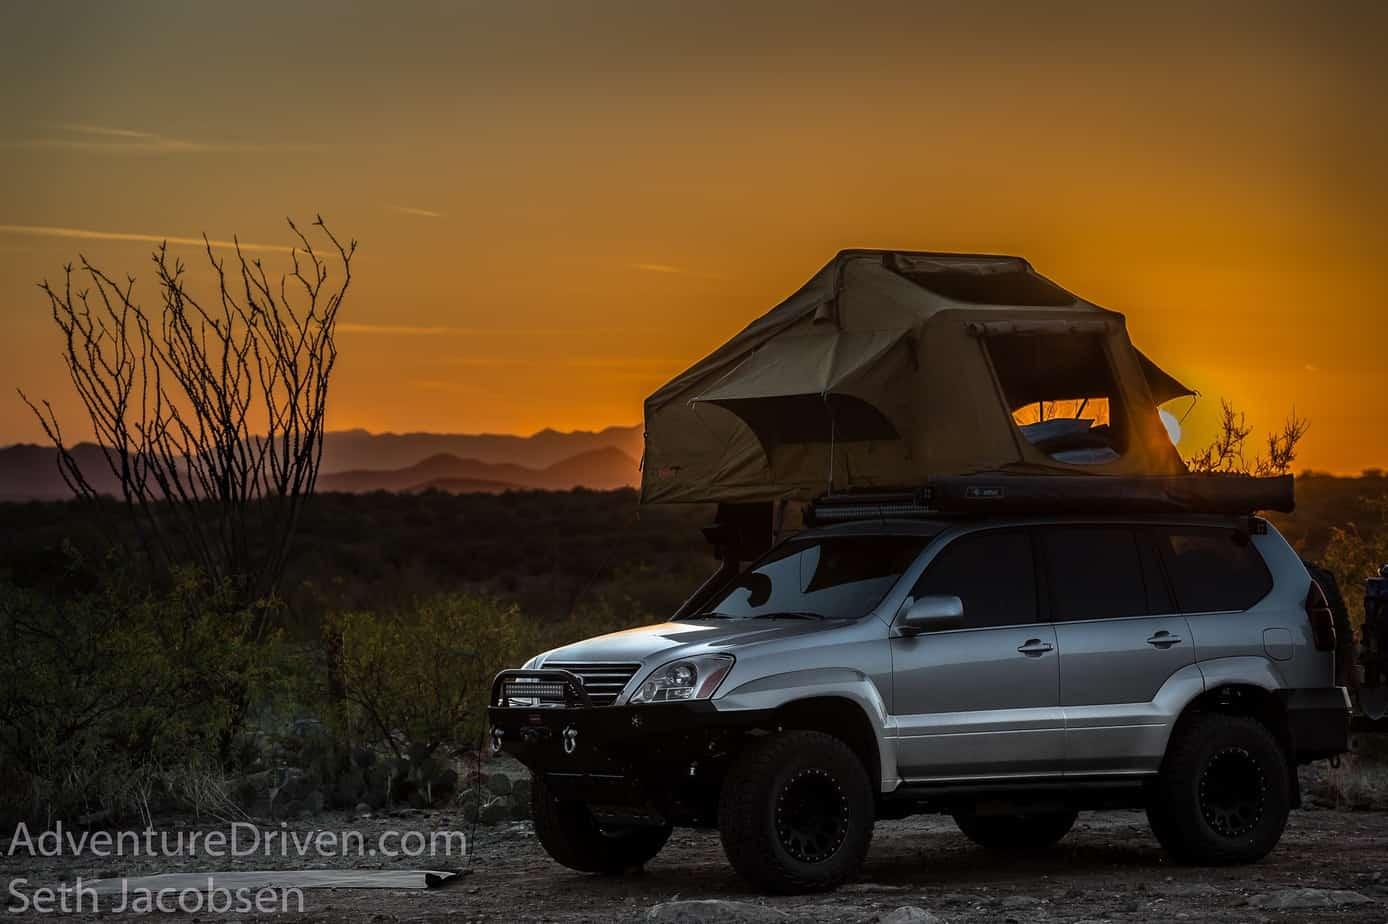 Adventure Driven 23 Zero tent sunset-1-2